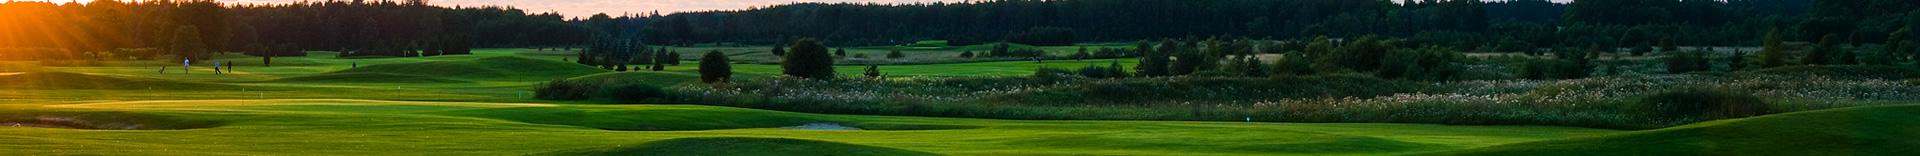 golfikeskus_vaike2